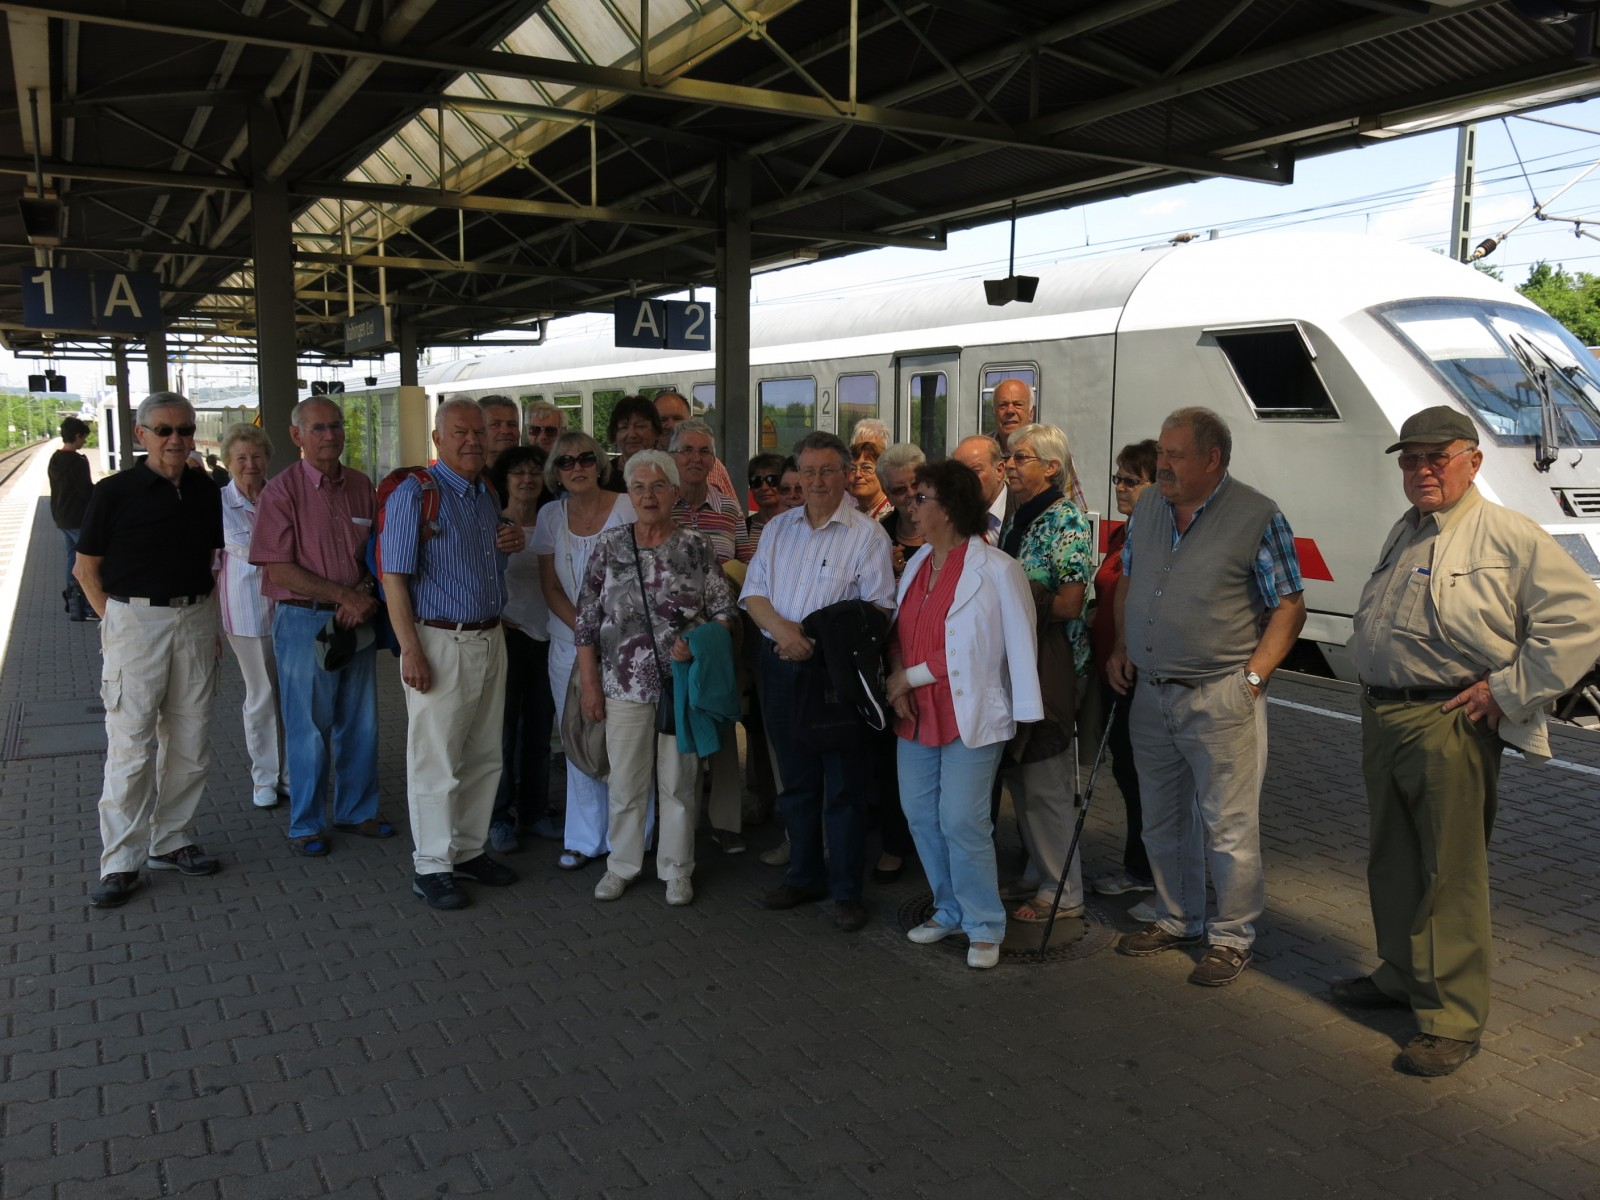 2015_05_13 am Bahnhof Vaihingen/Enz